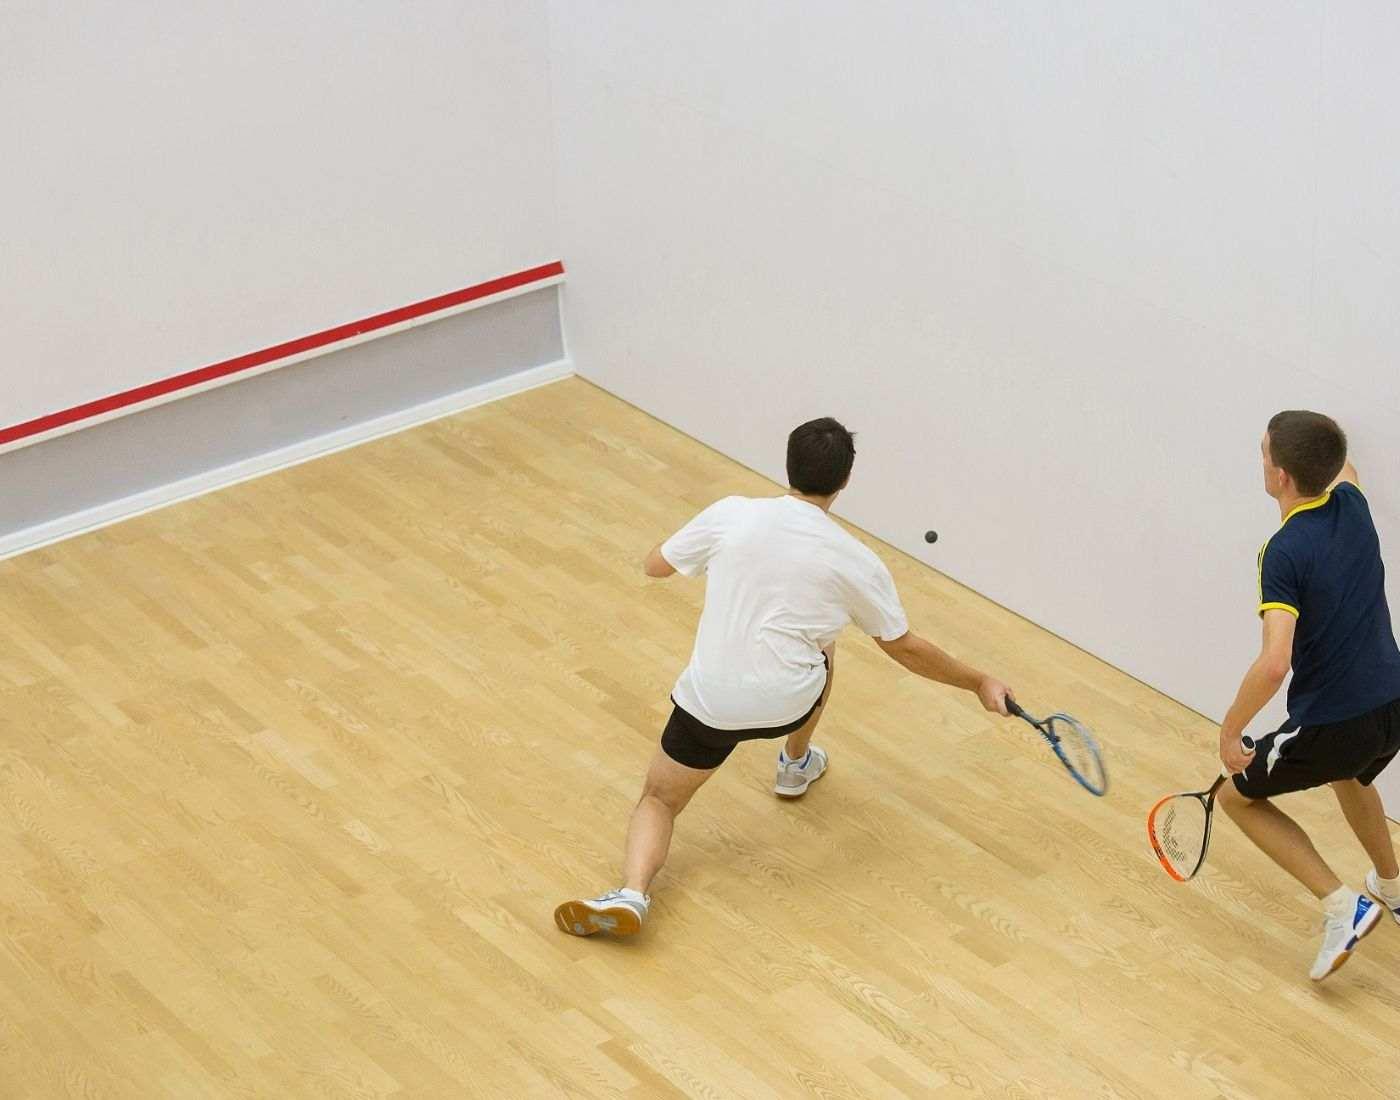 Squash sports